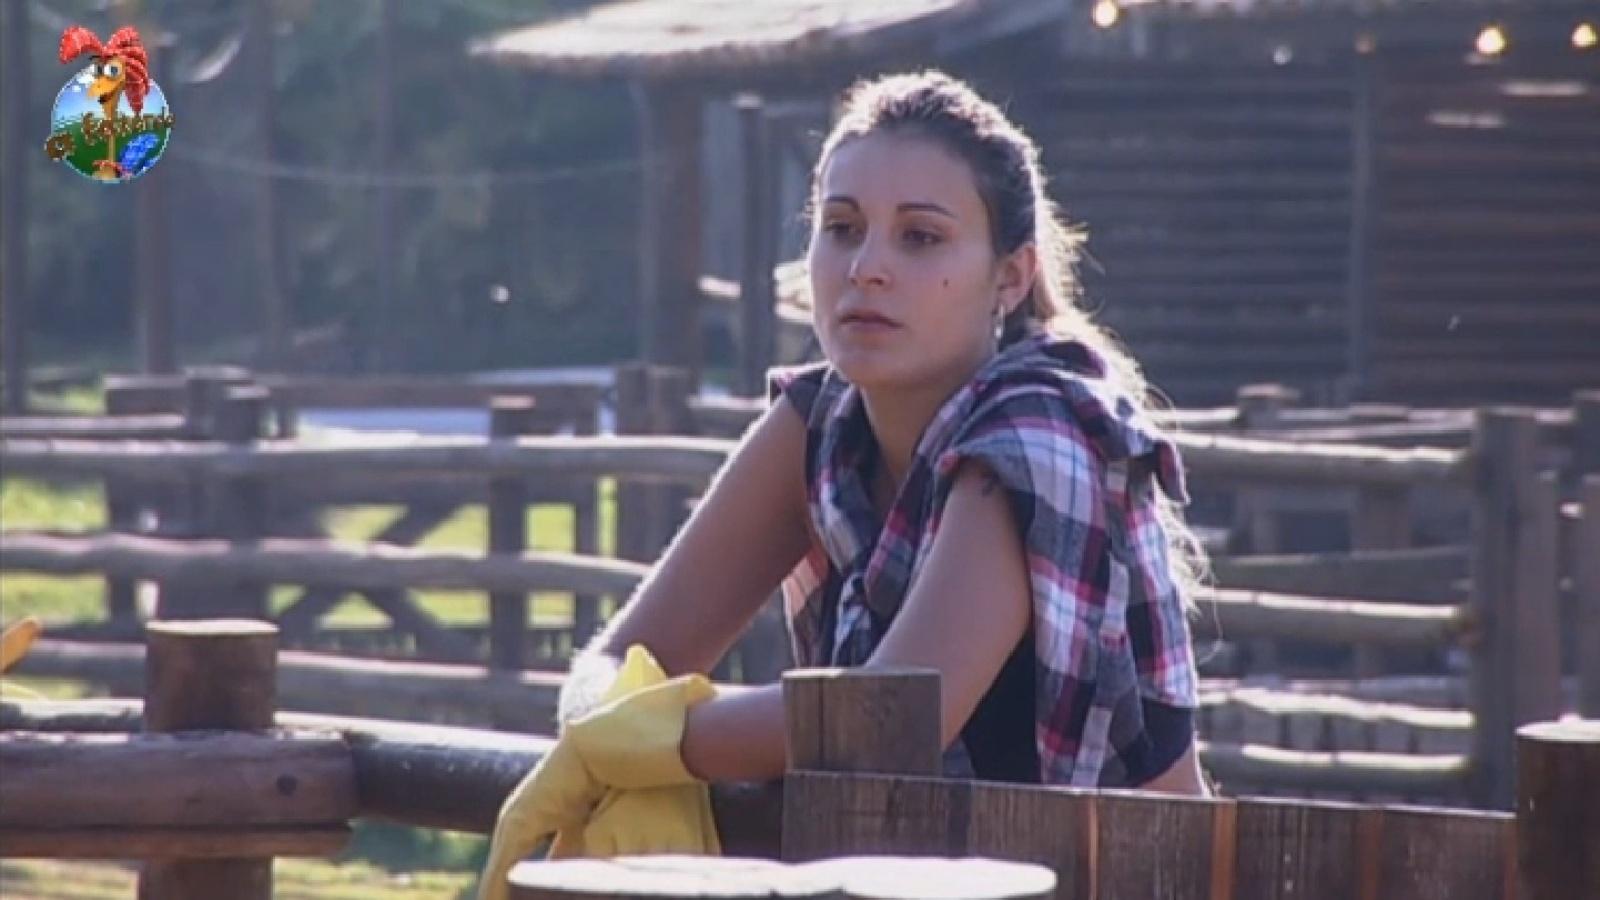 24.ago.2013 - Fazendeira da semana, Andressa Urach observa as ovelhas